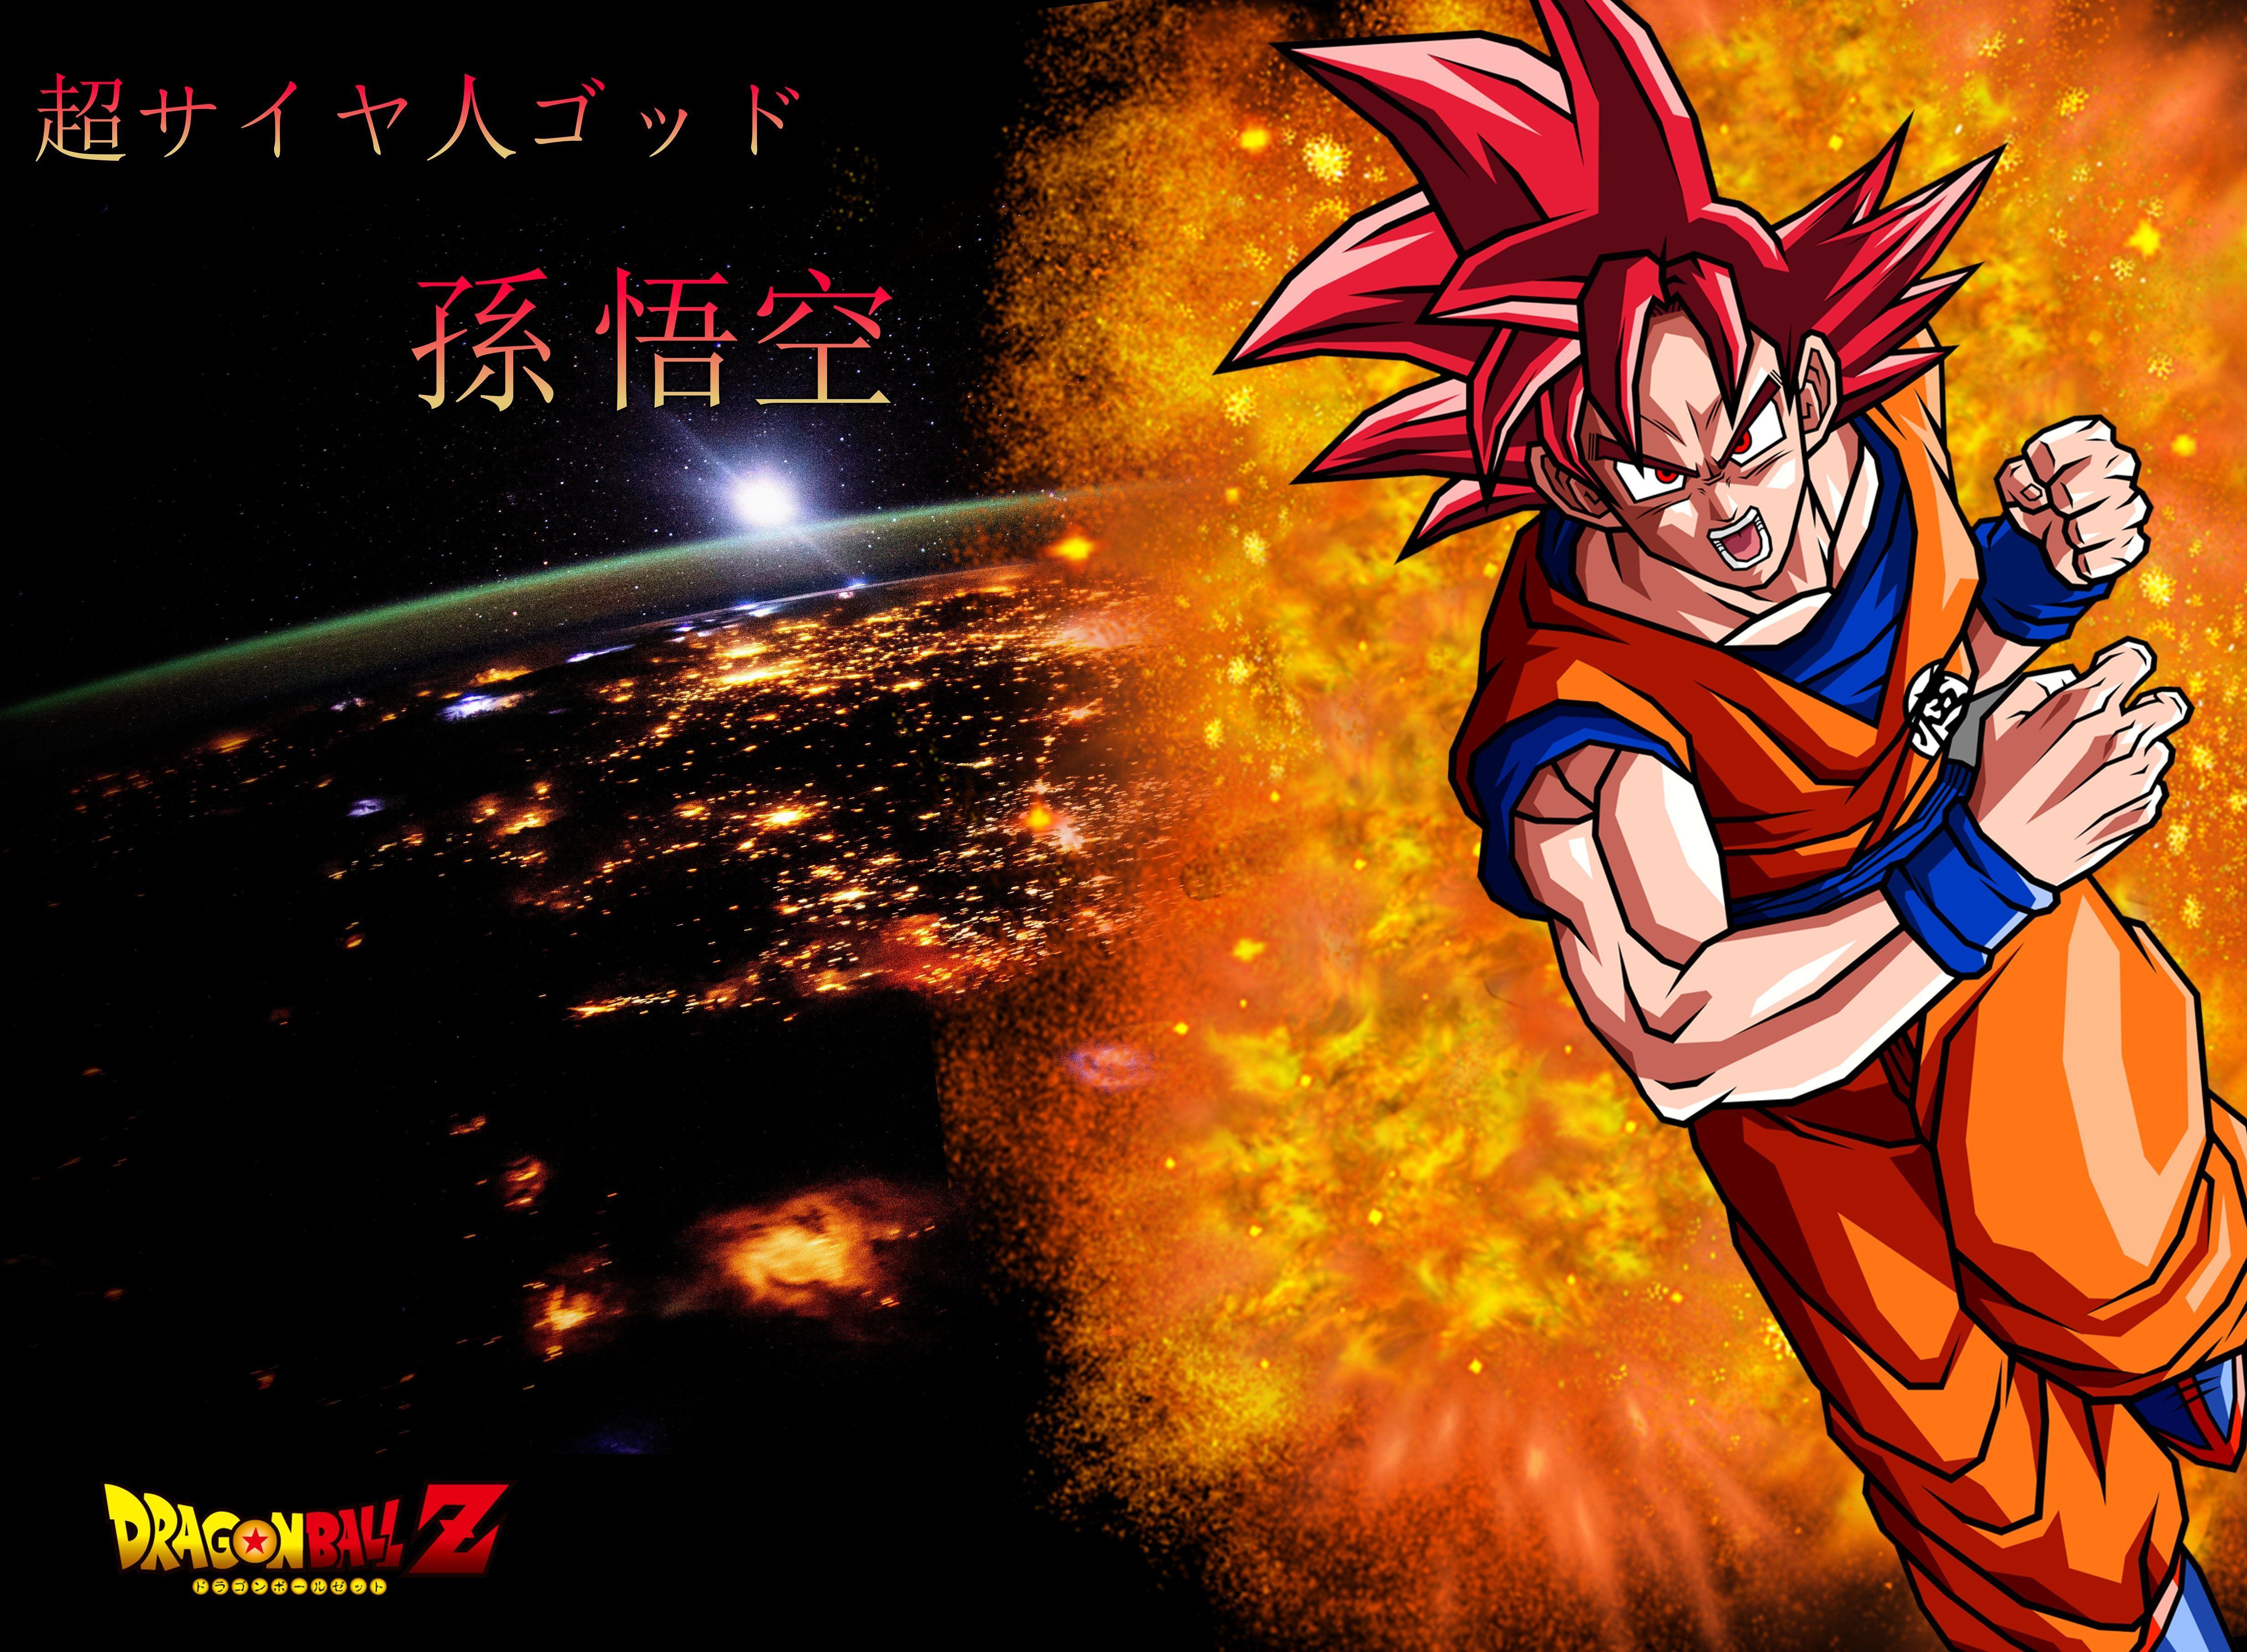 Super Saiyan Live Wallpaper Iphone X Goku Ssj God Wallpapers Wallpaper Cave